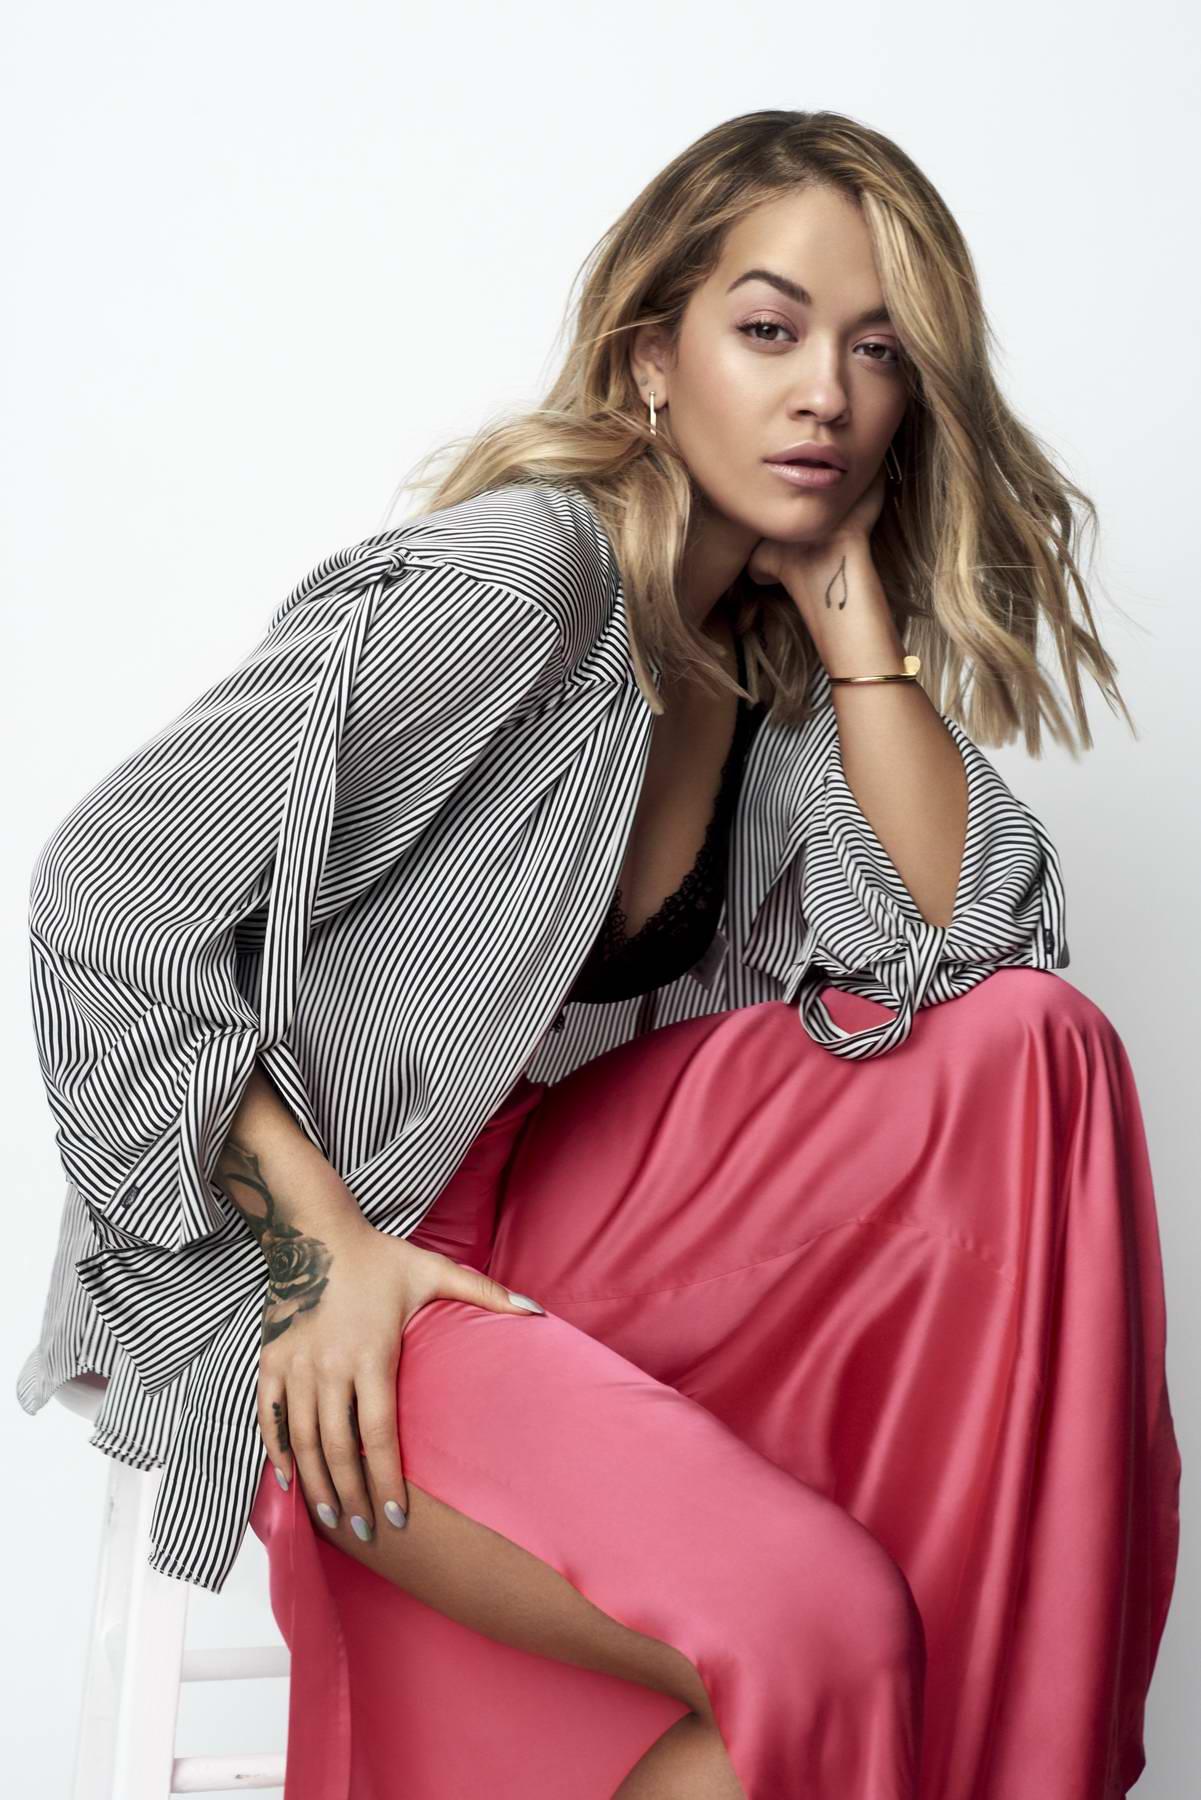 Rita Ora Cassie Lomas Makeup Academy Glamour Magazine